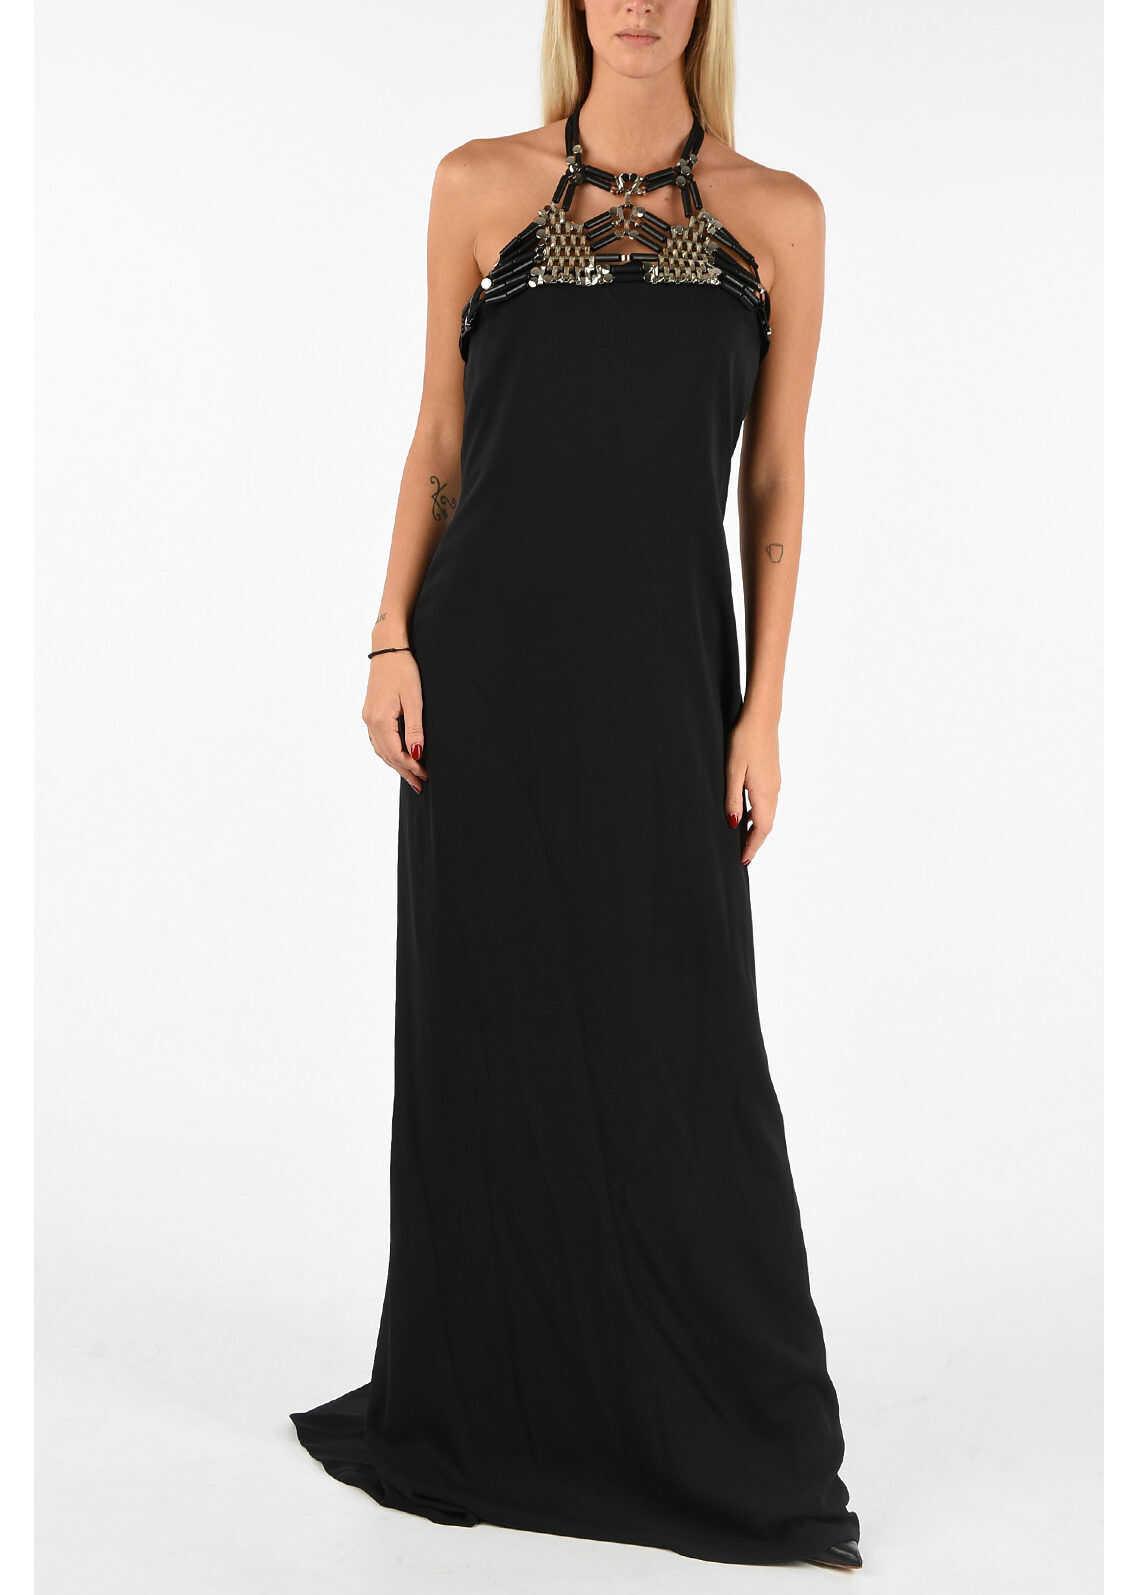 Gucci Silk Gown BLACK